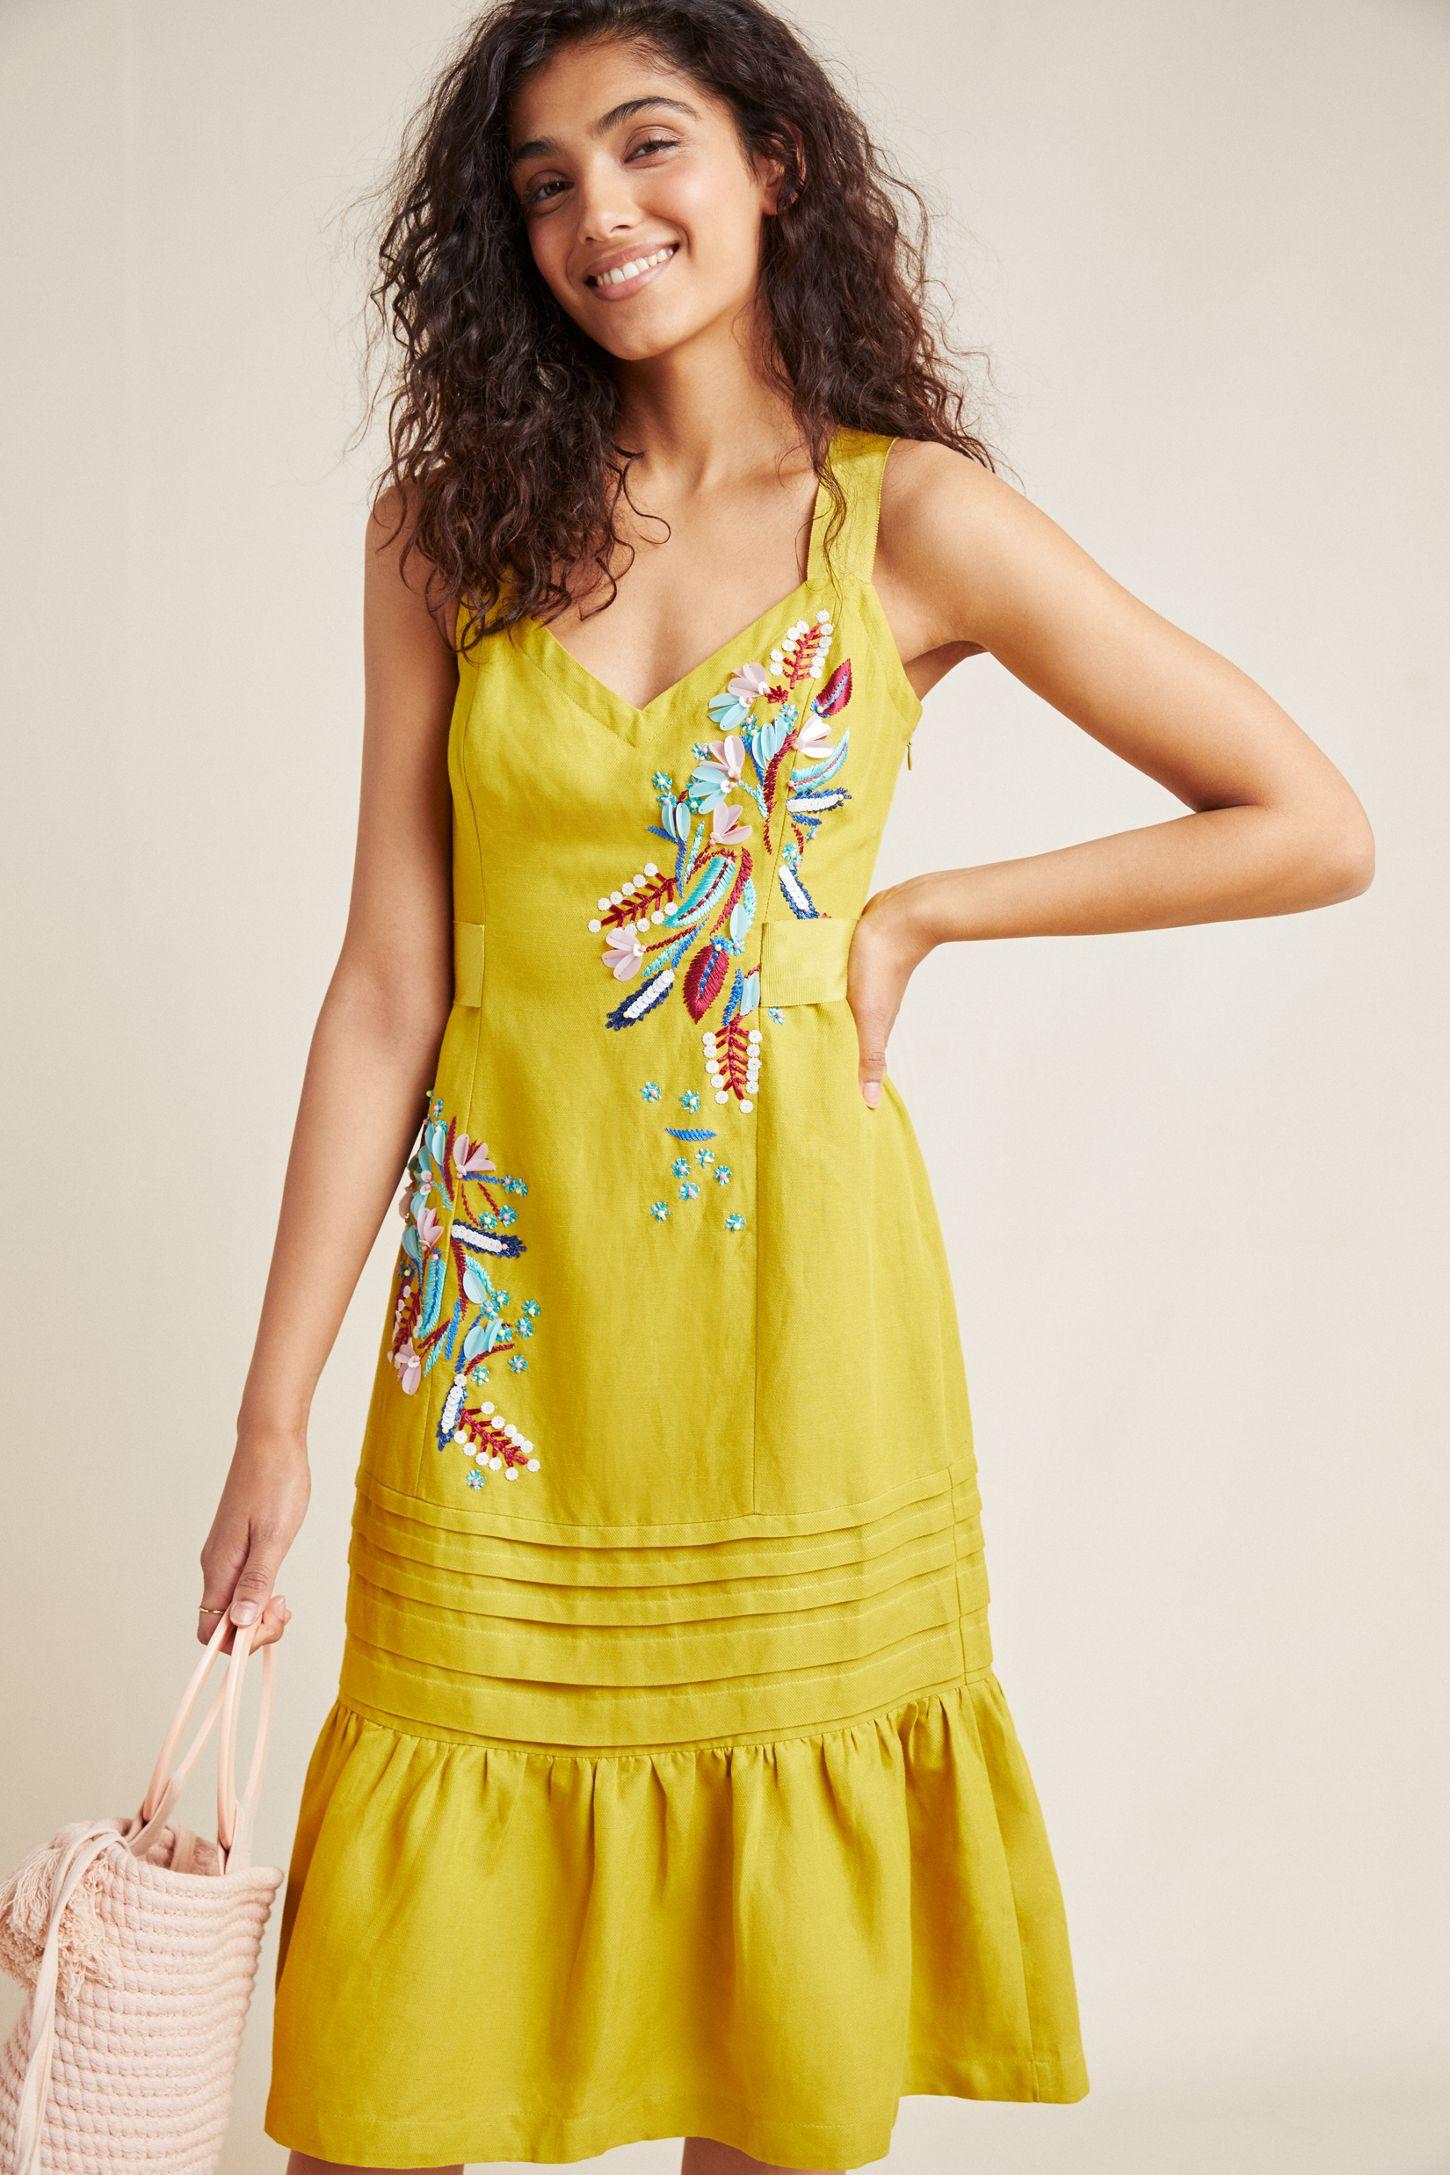 fabfa300e4 Chicory Beaded Dress | Anthropologie